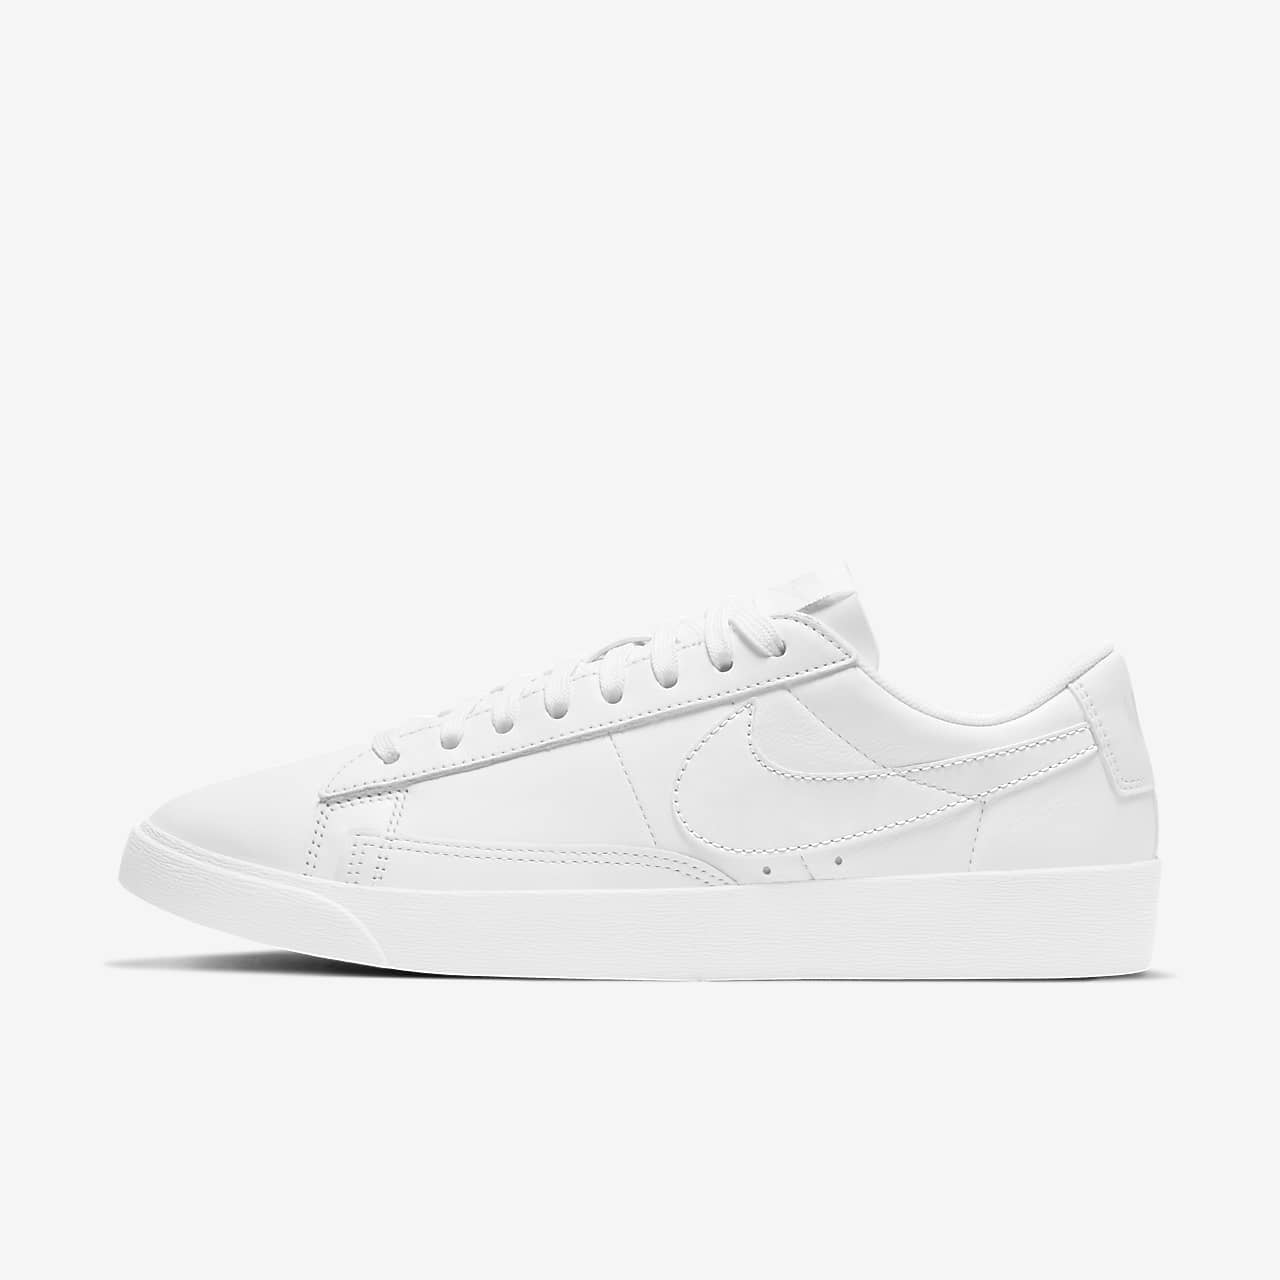 online shop quality products discount Buty damskie Nike Blazer Low LE